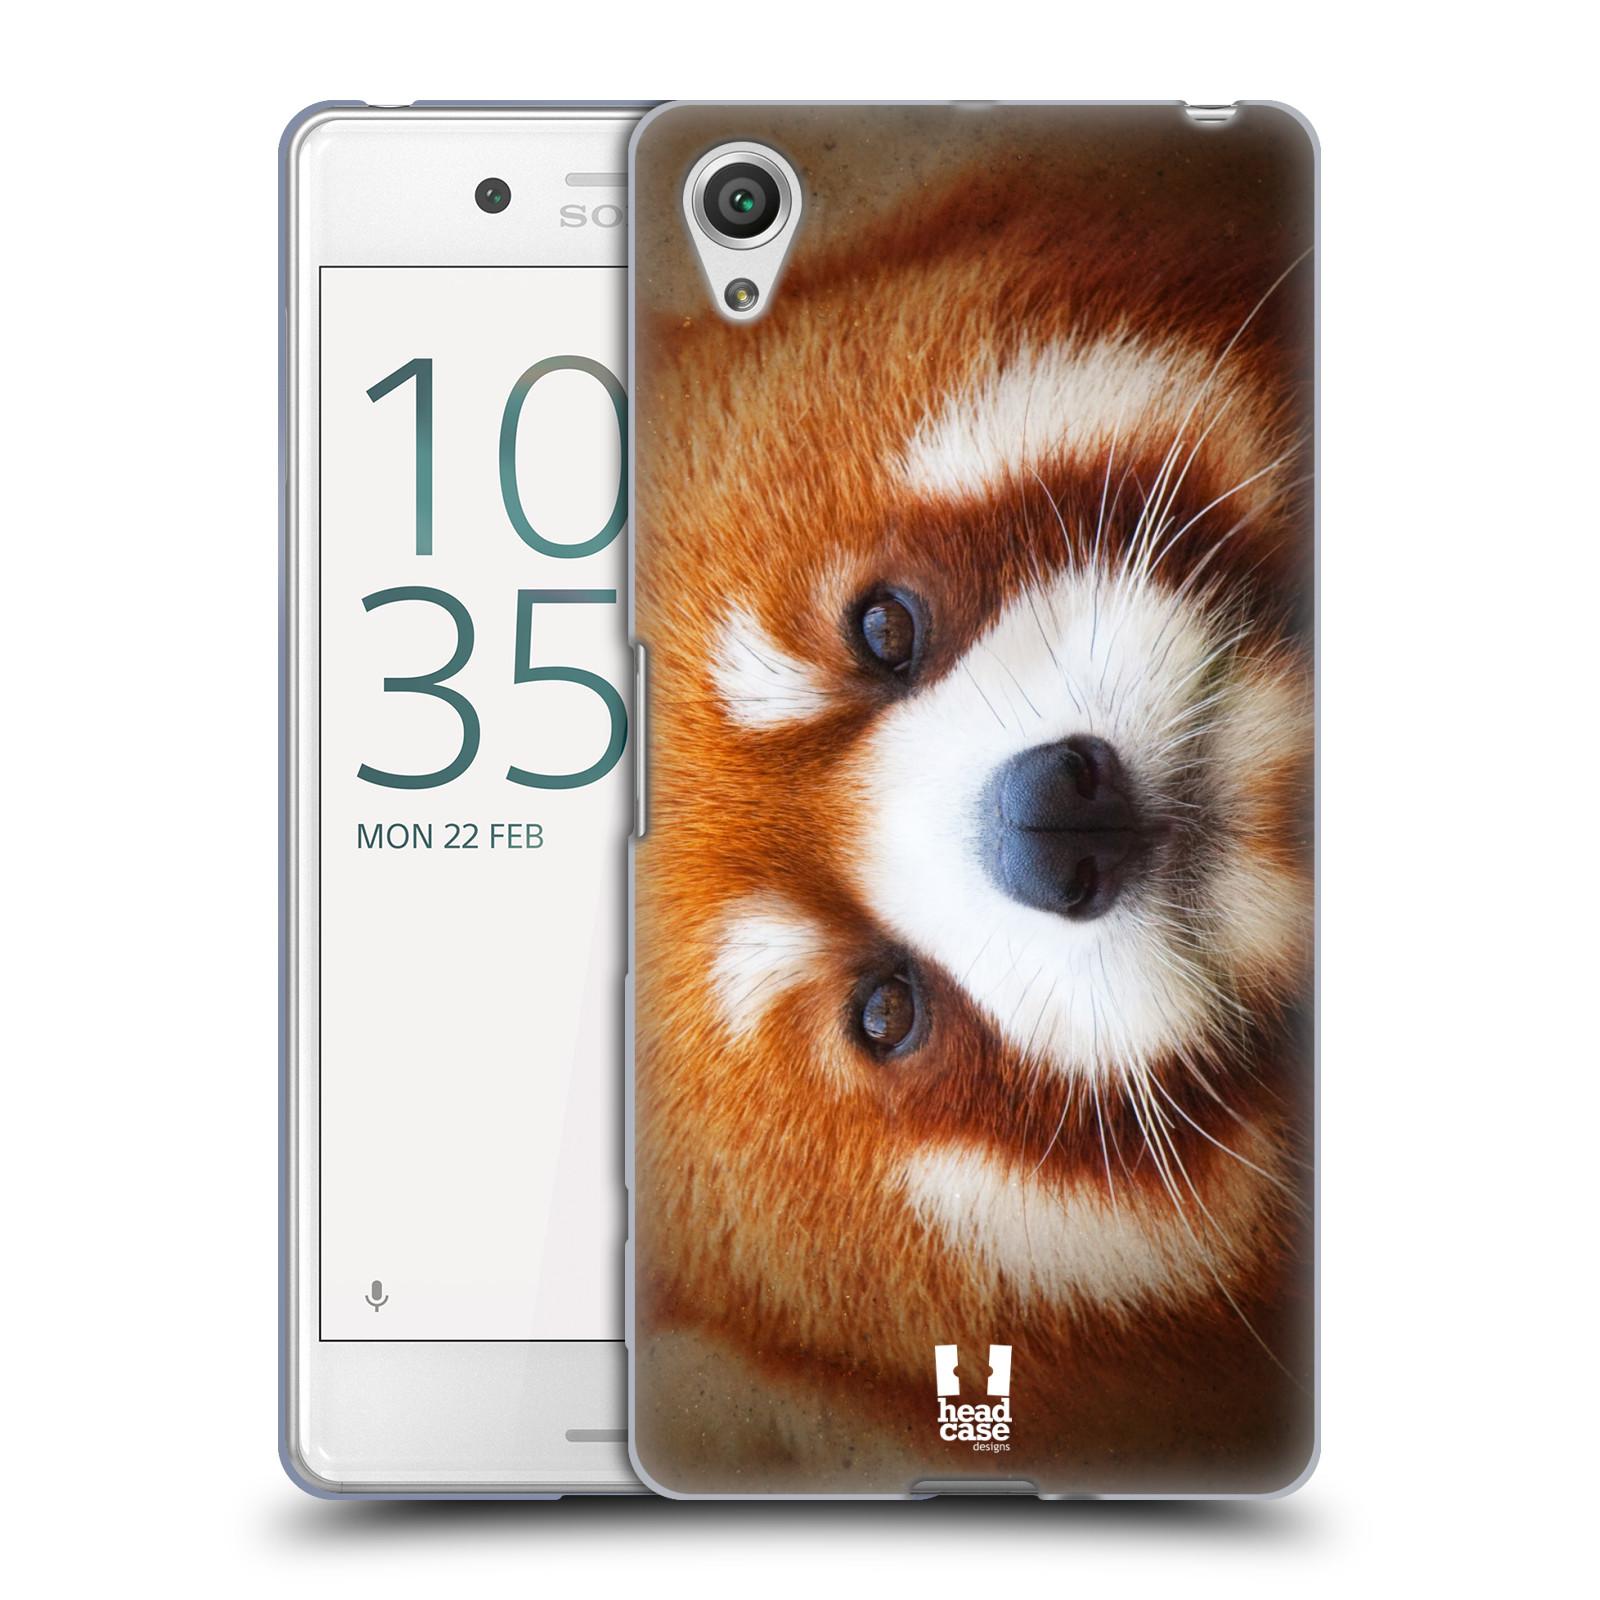 HEAD CASE silikonový obal na mobil Sony Xperia X PERFORMANCE (F8131, F8132) vzor Zvířecí tváře 2 medvěd panda rudá